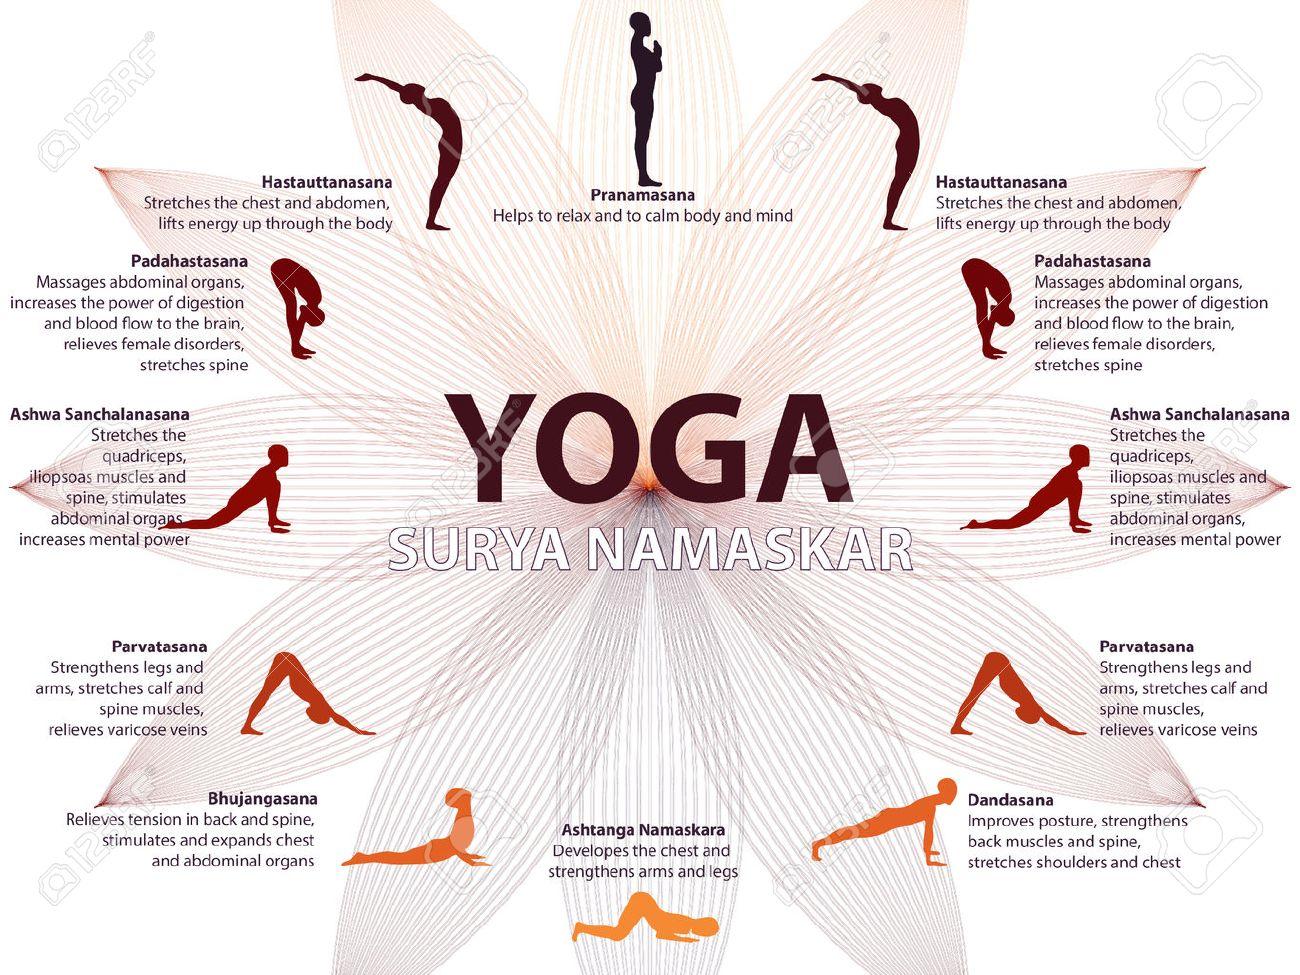 Yoga infographics, Surya Namaskar sequence, Salutation to the Sun, benefits of practice - 51739270